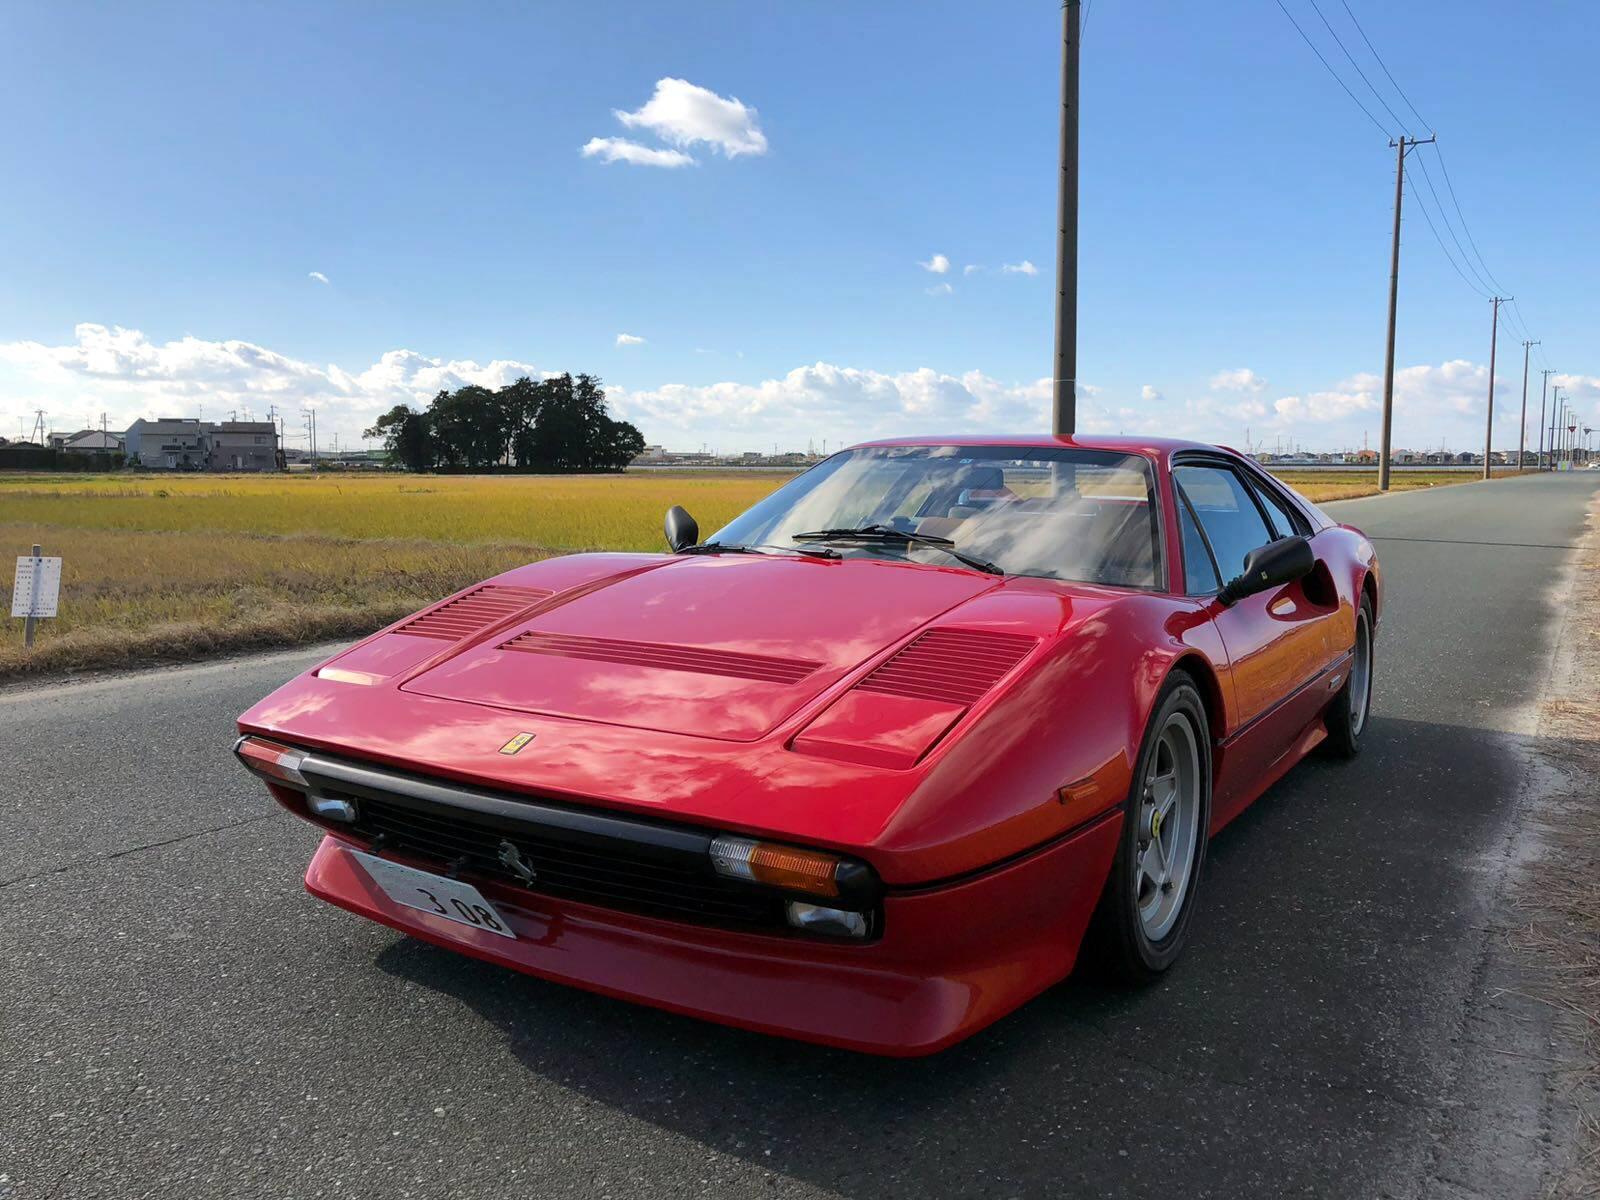 1982 Ferrari 308 GTB Quattrovalve - € 79.308.- US $ 94.308.-